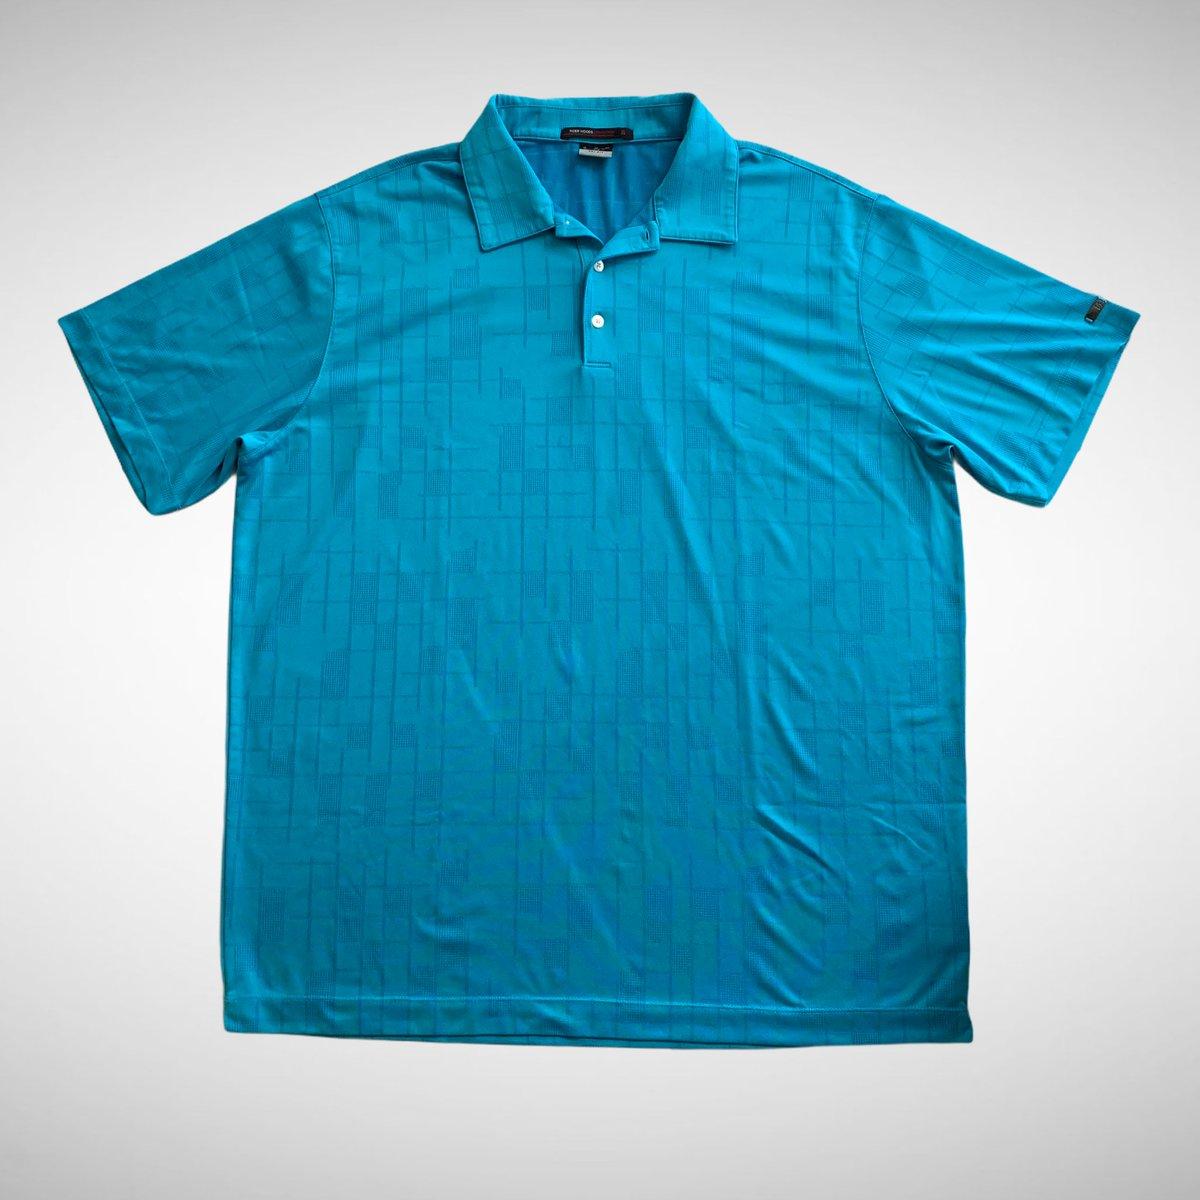 Check out #nike #golf #drifit #Poloshirt Short Sleeve #Shirt Size #XL #Men #tigerwoods Collection https://t.co/gZegBsrb20 @eBay https://t.co/ozauzzu3R7